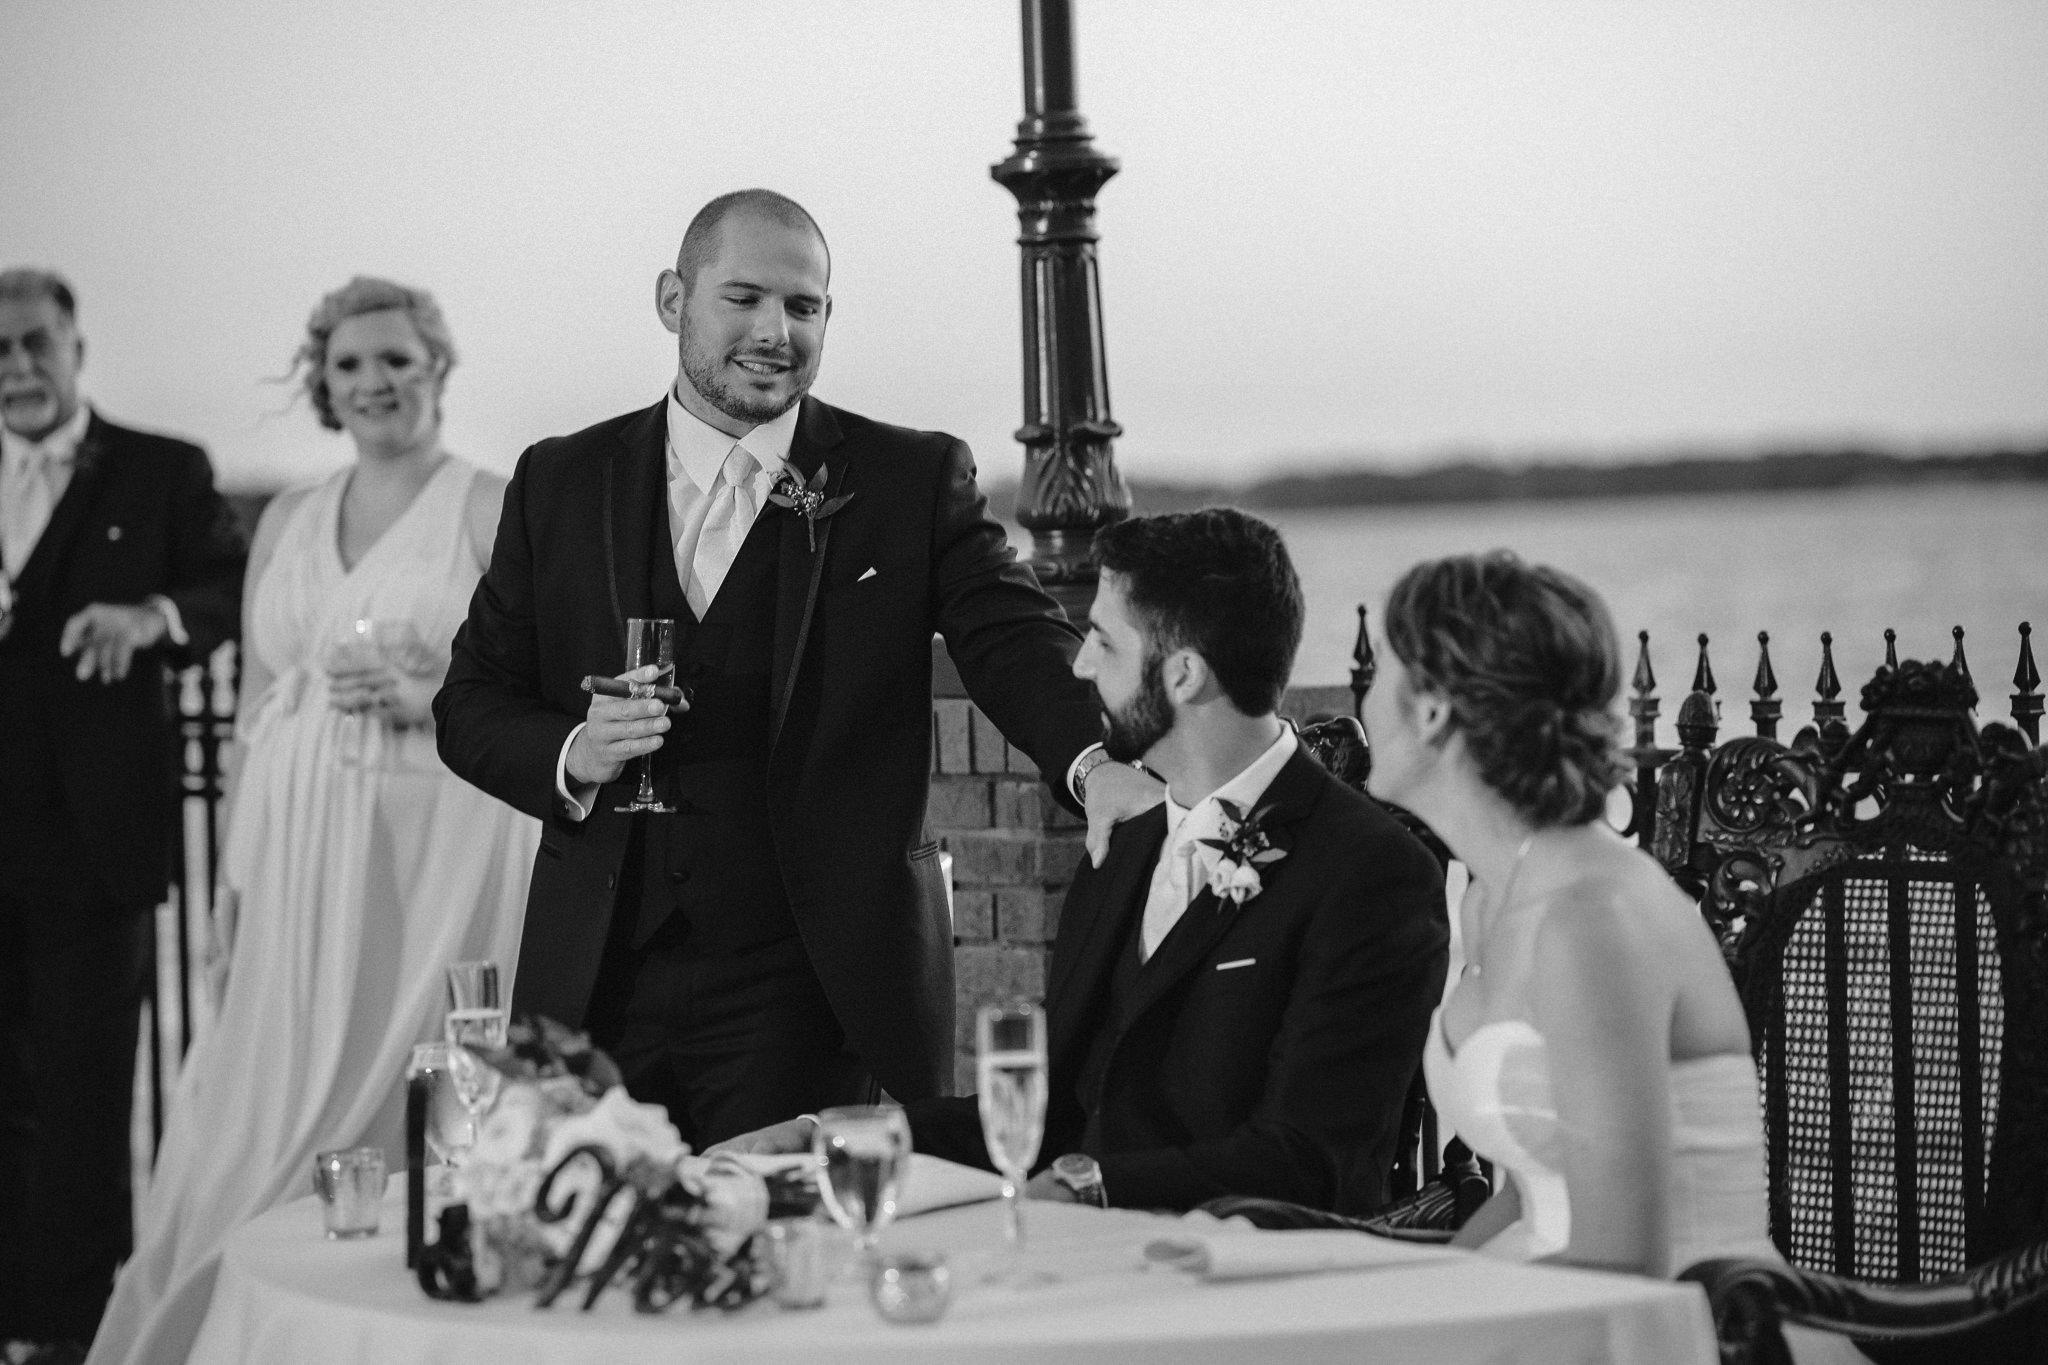 Tavares+Pavilion+on+the+Lake+Wedding+Florida_038.jpg